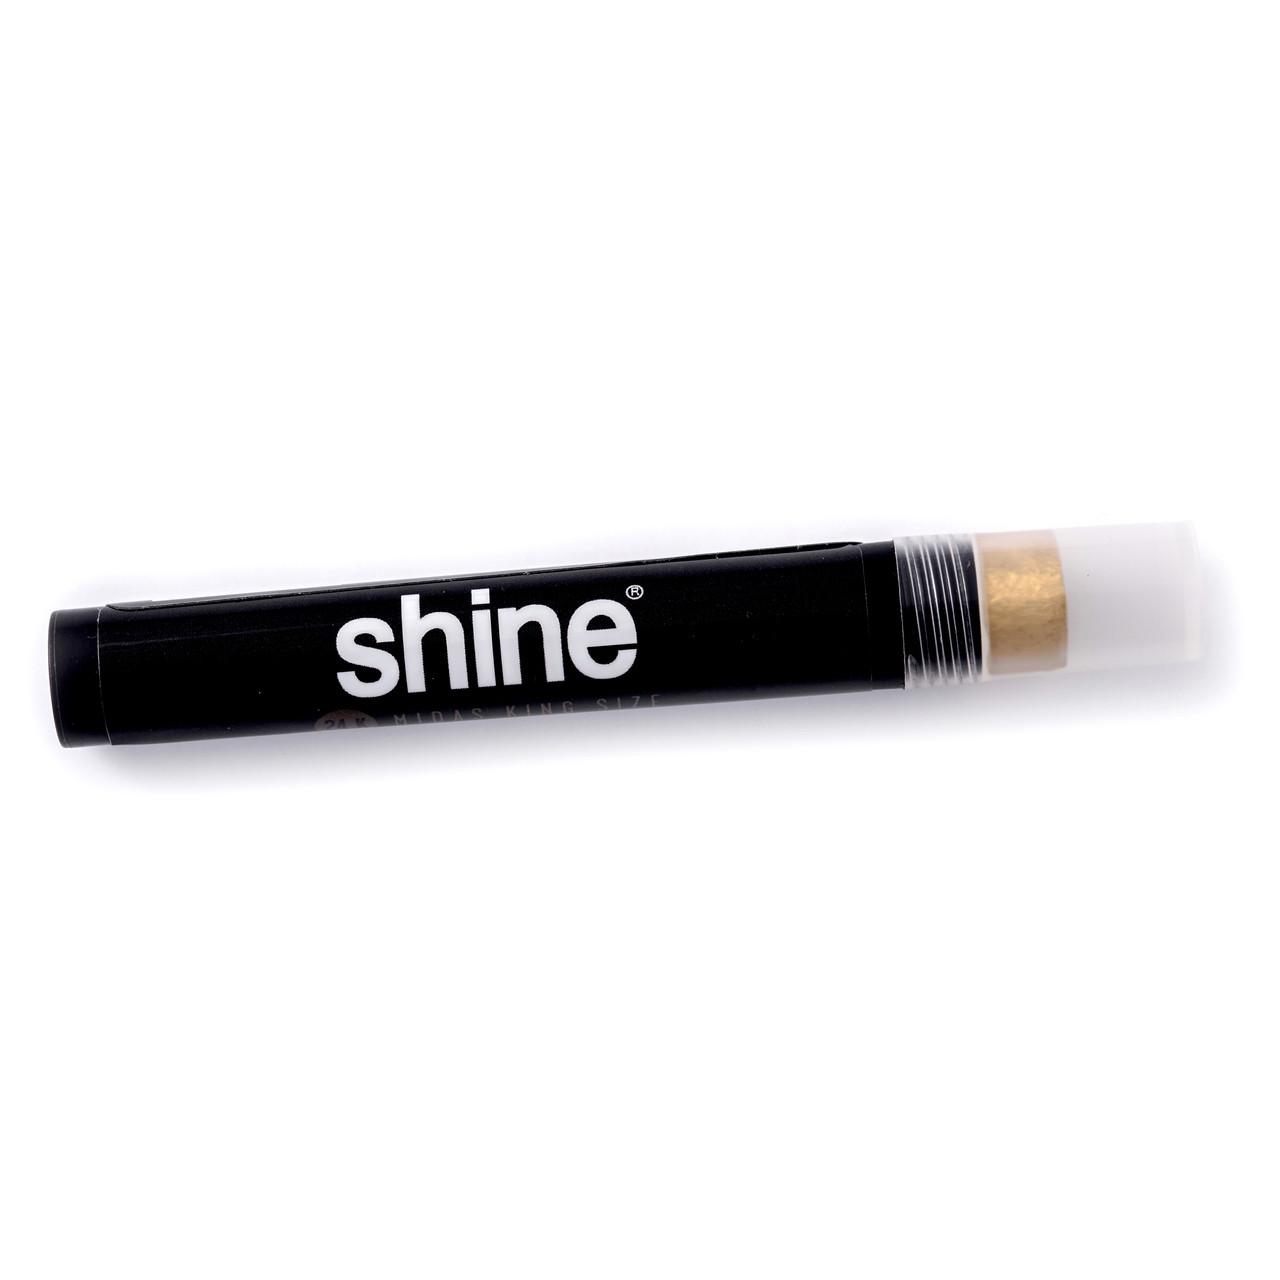 Shine 24k King Sized Cones